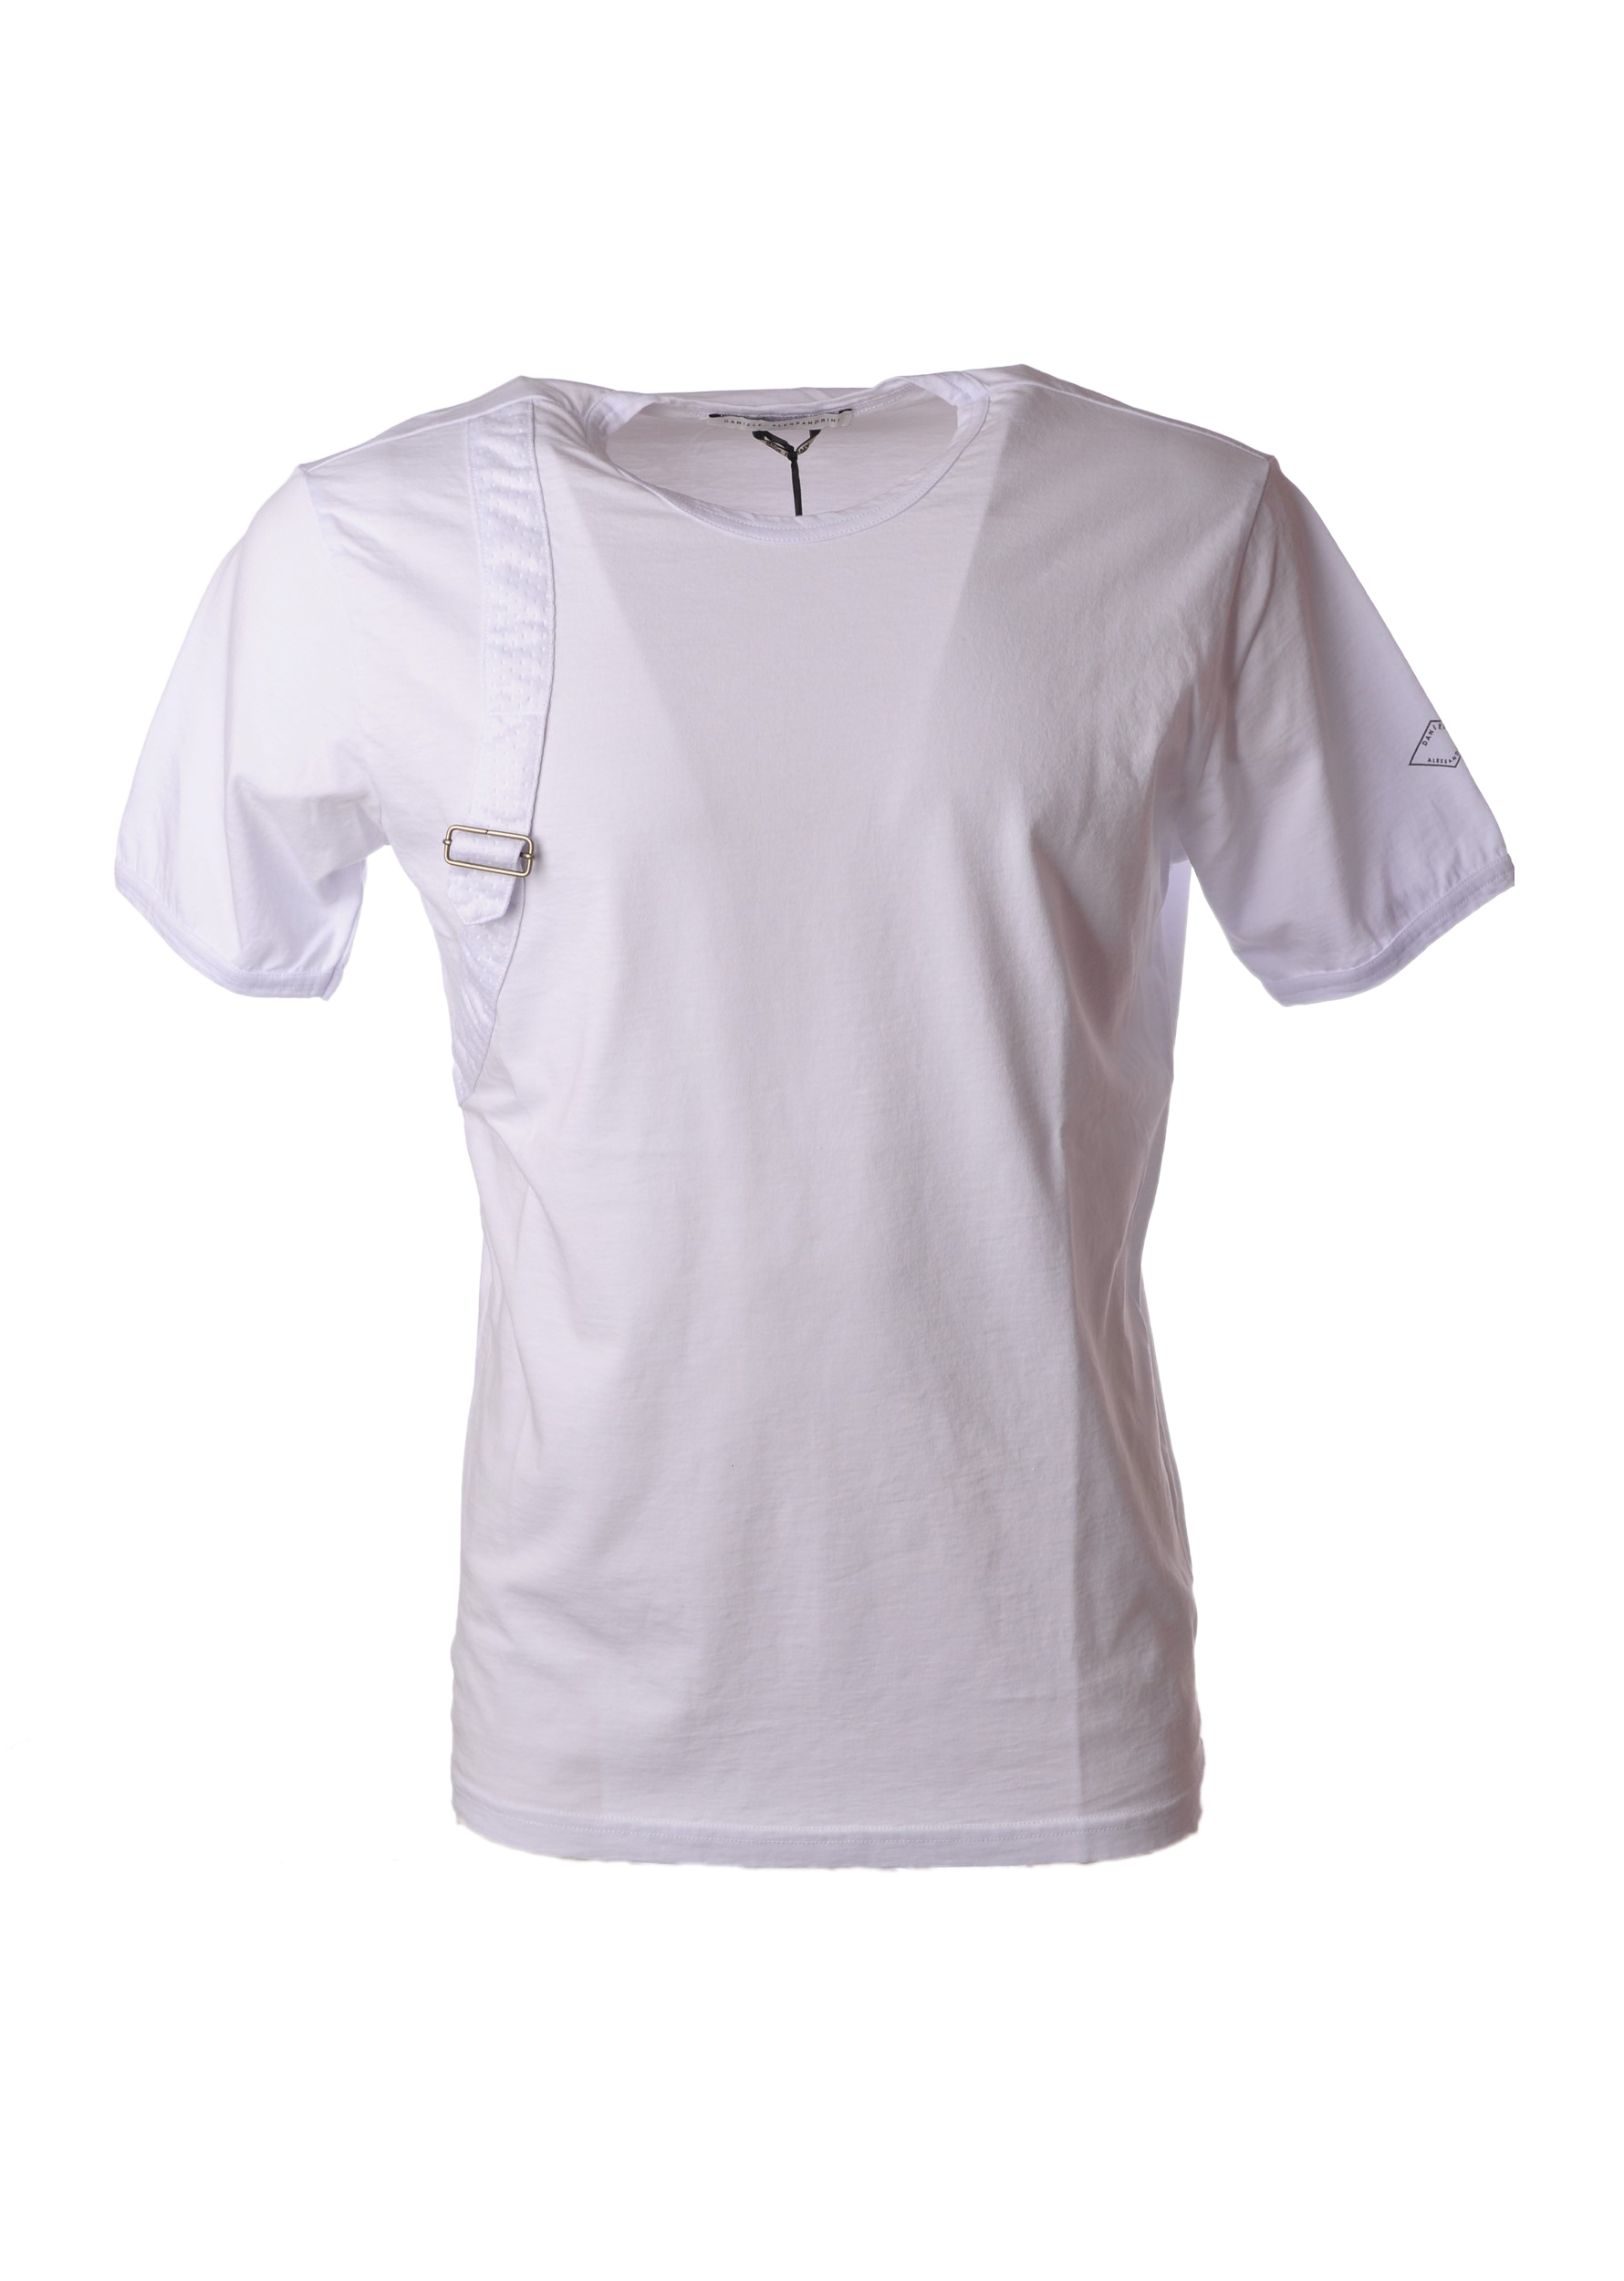 "Daniele Alessandrini ""t-shirt dettaglio"" T-shirts"